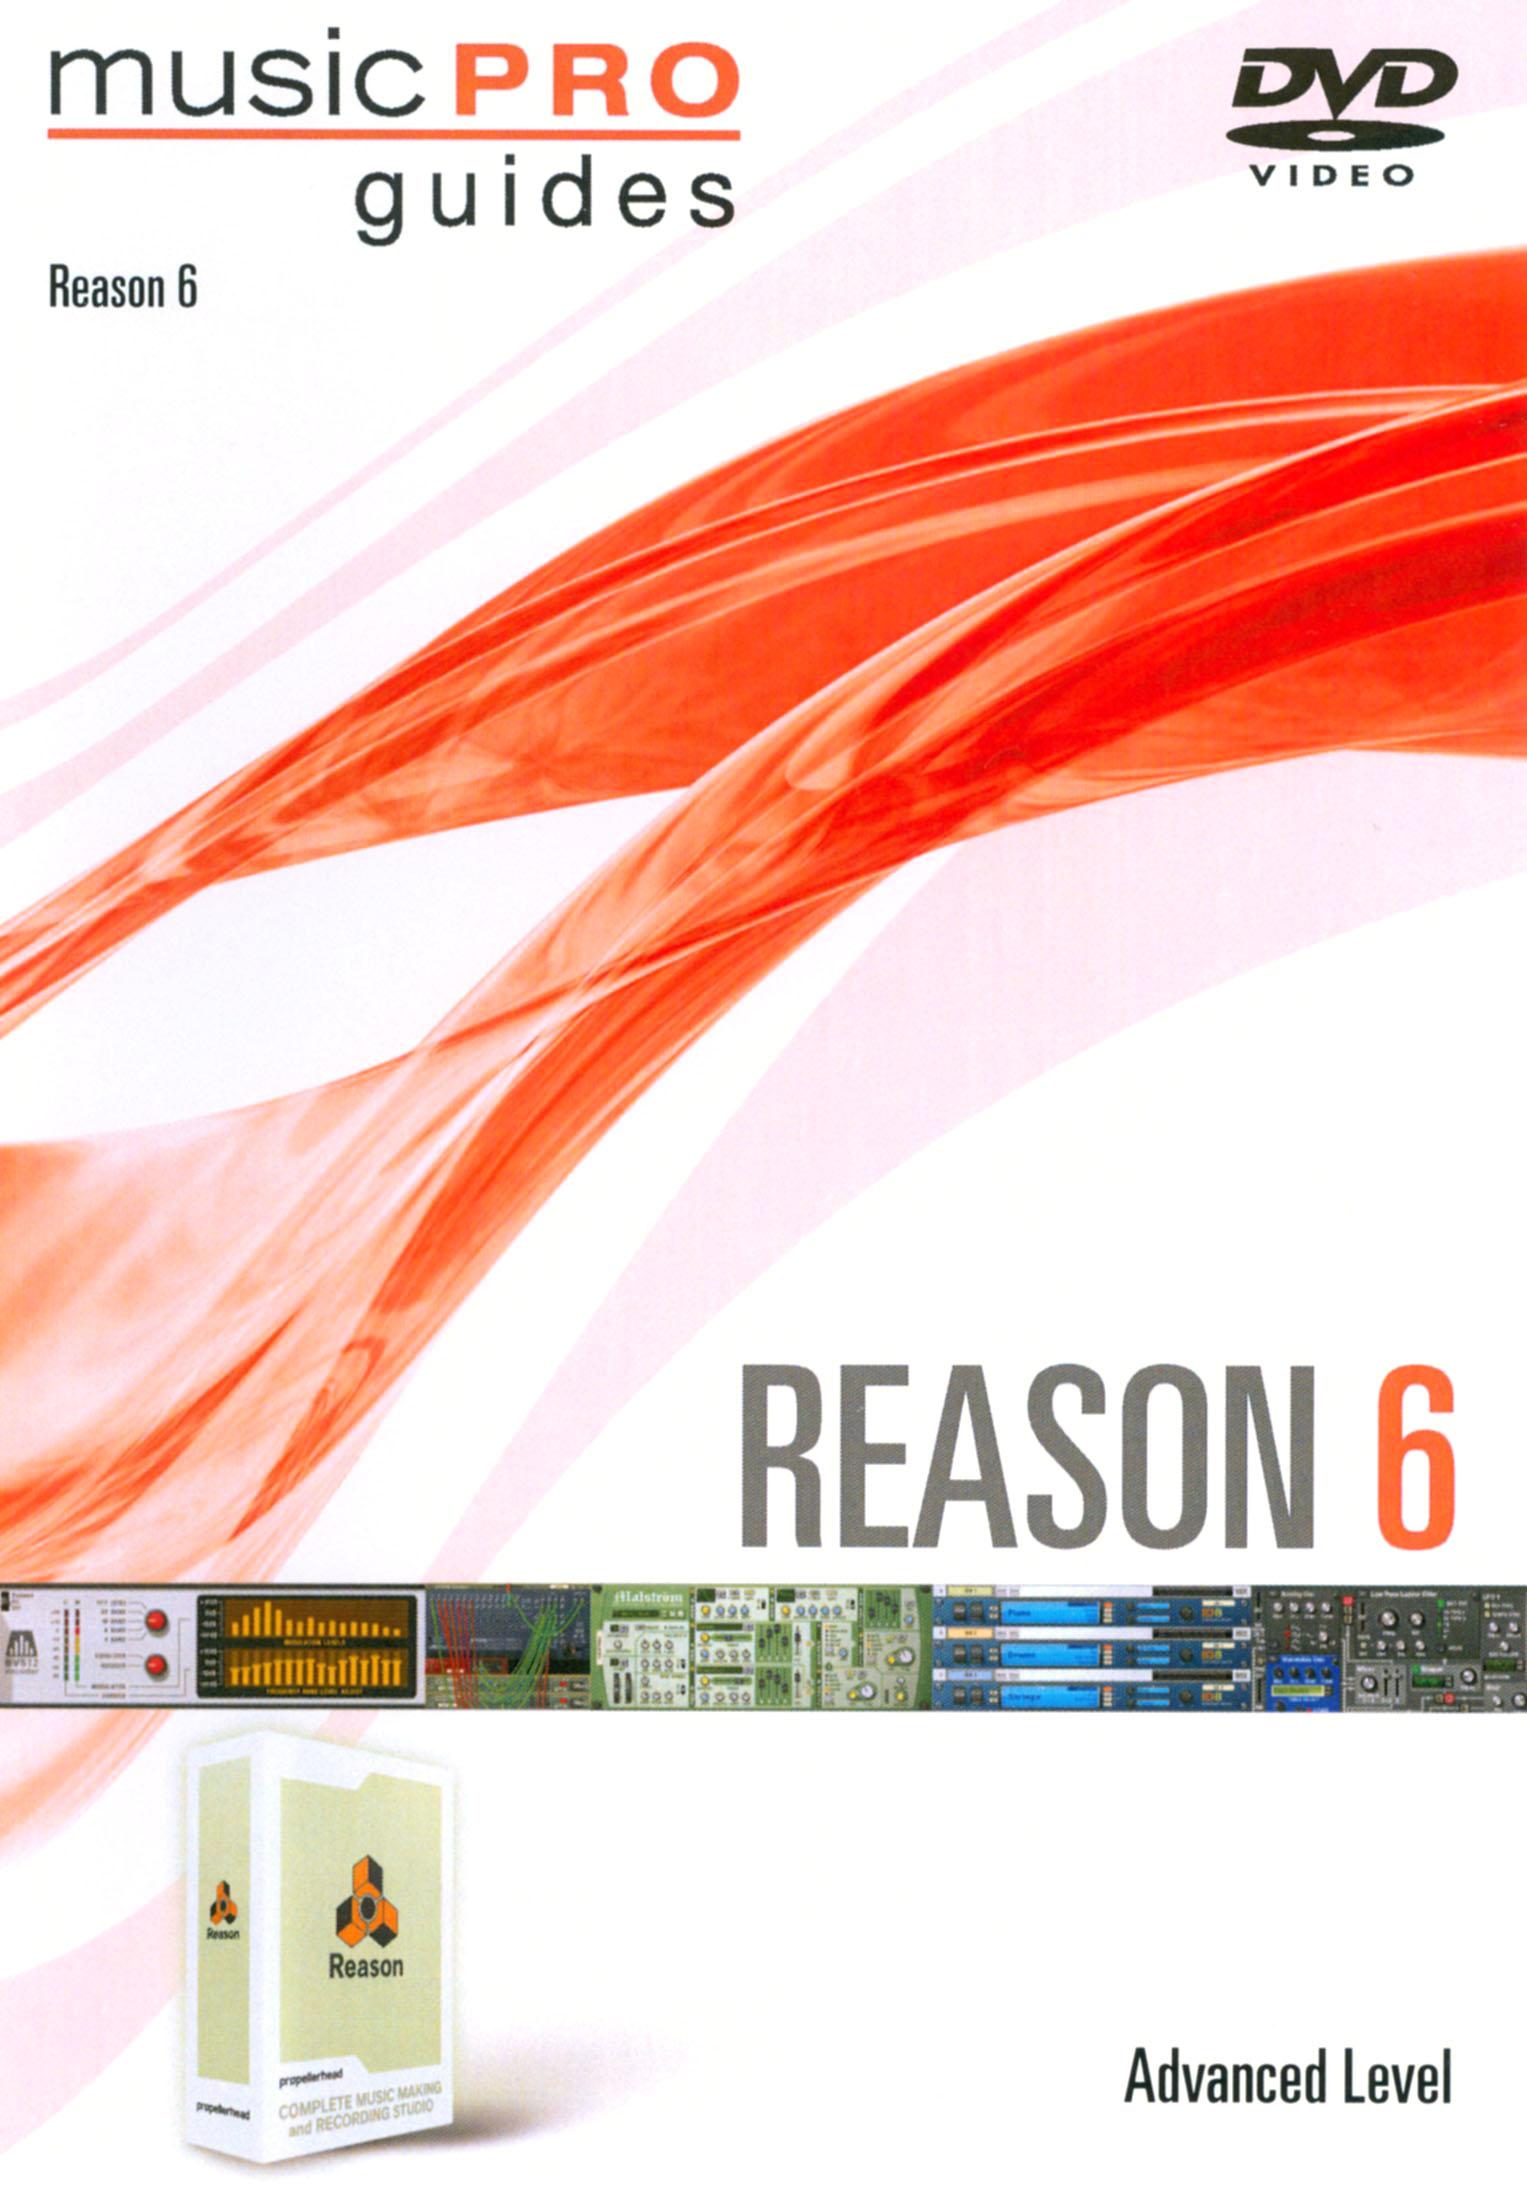 MusicPro Guides: Reason 6 - Advanced Level